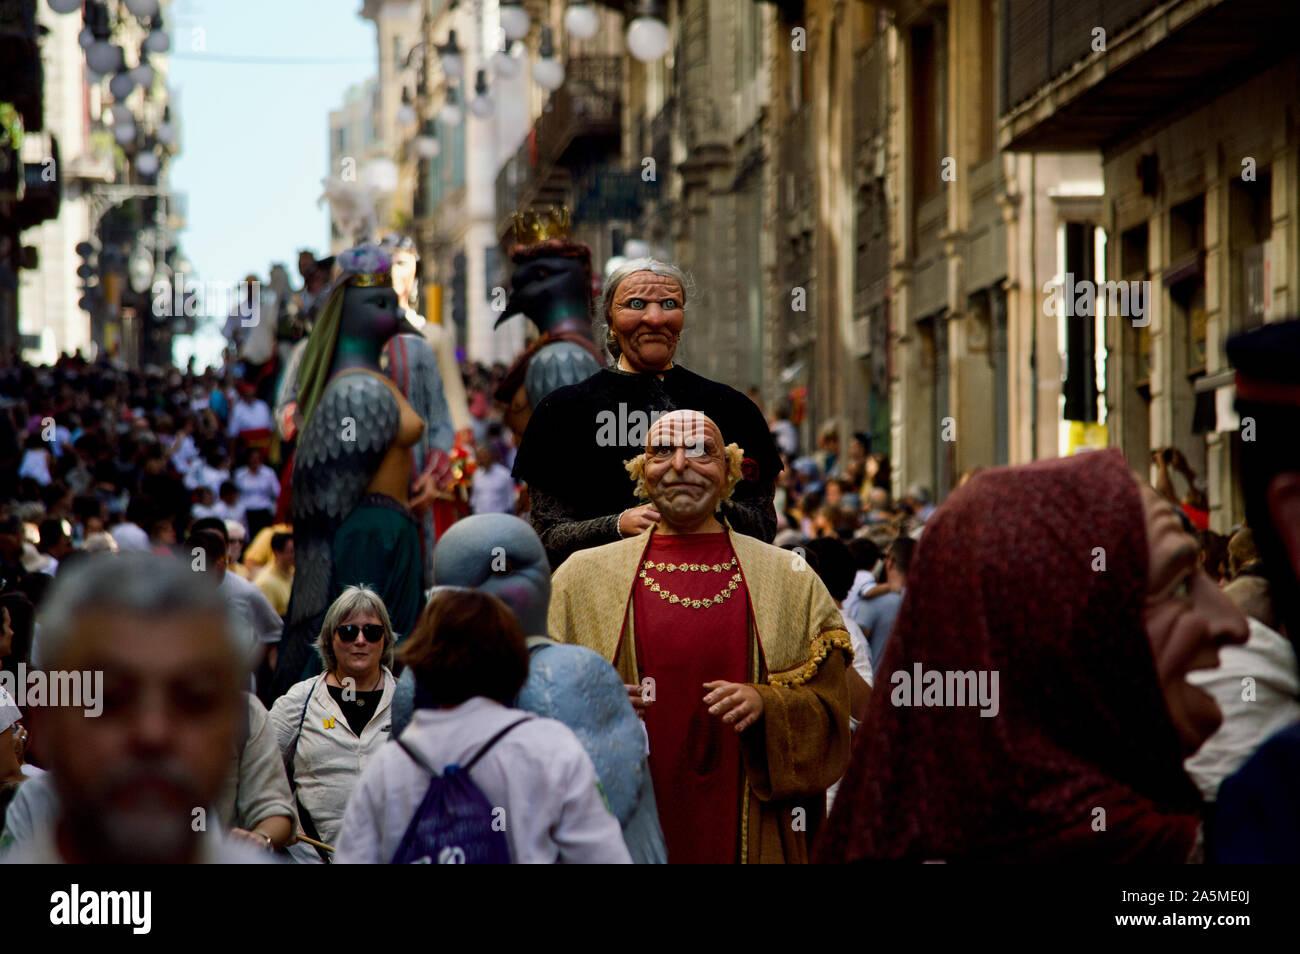 The Giants Parade during La Merce Festival 2019 at Placa de Sant Jaume in Barcelona, Spain Stock Photo